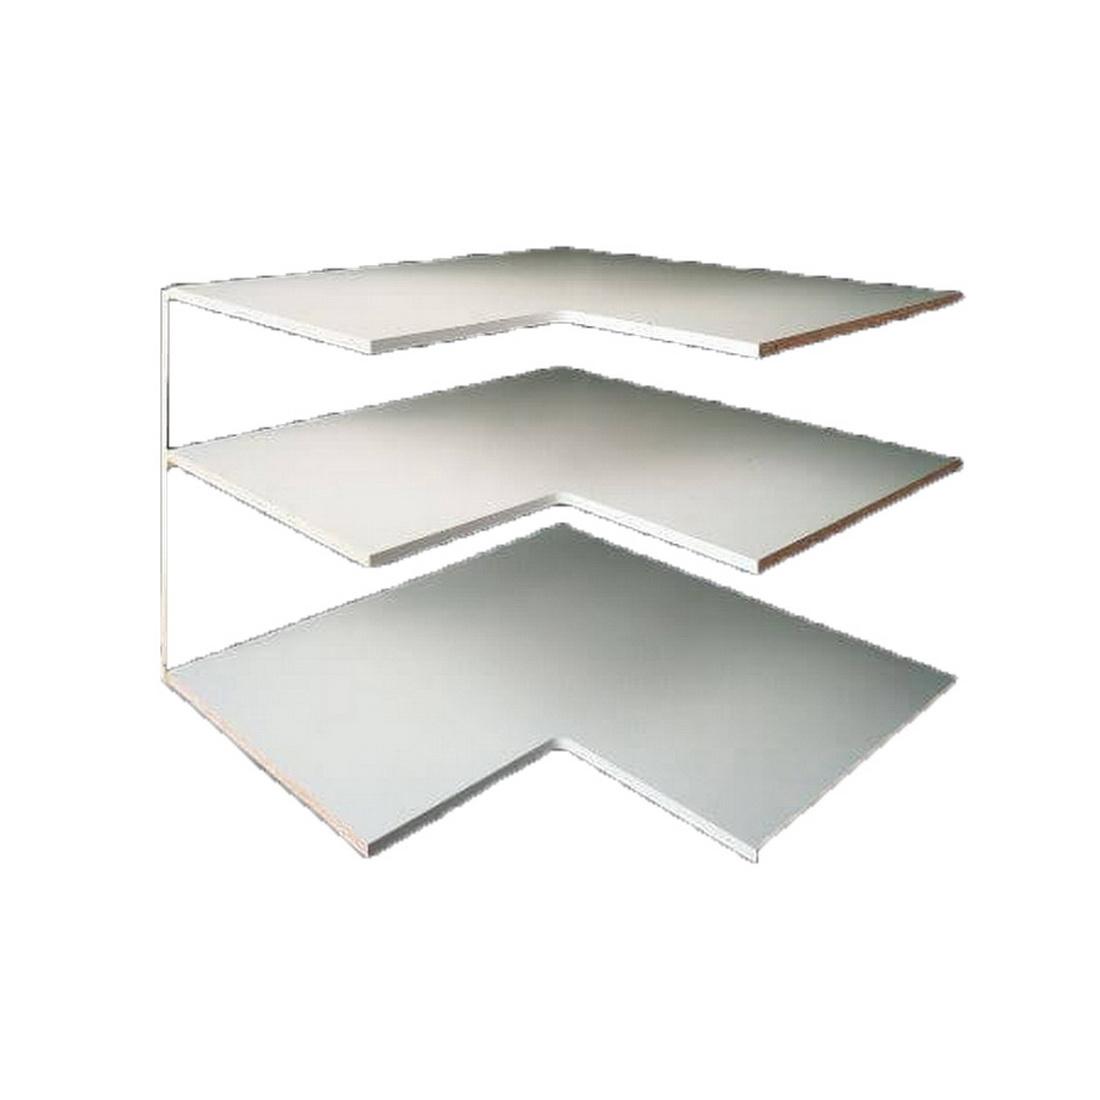 Laminex Whiteboard MDF Panel 2440 x 1220 x 18 mm Satin 872712